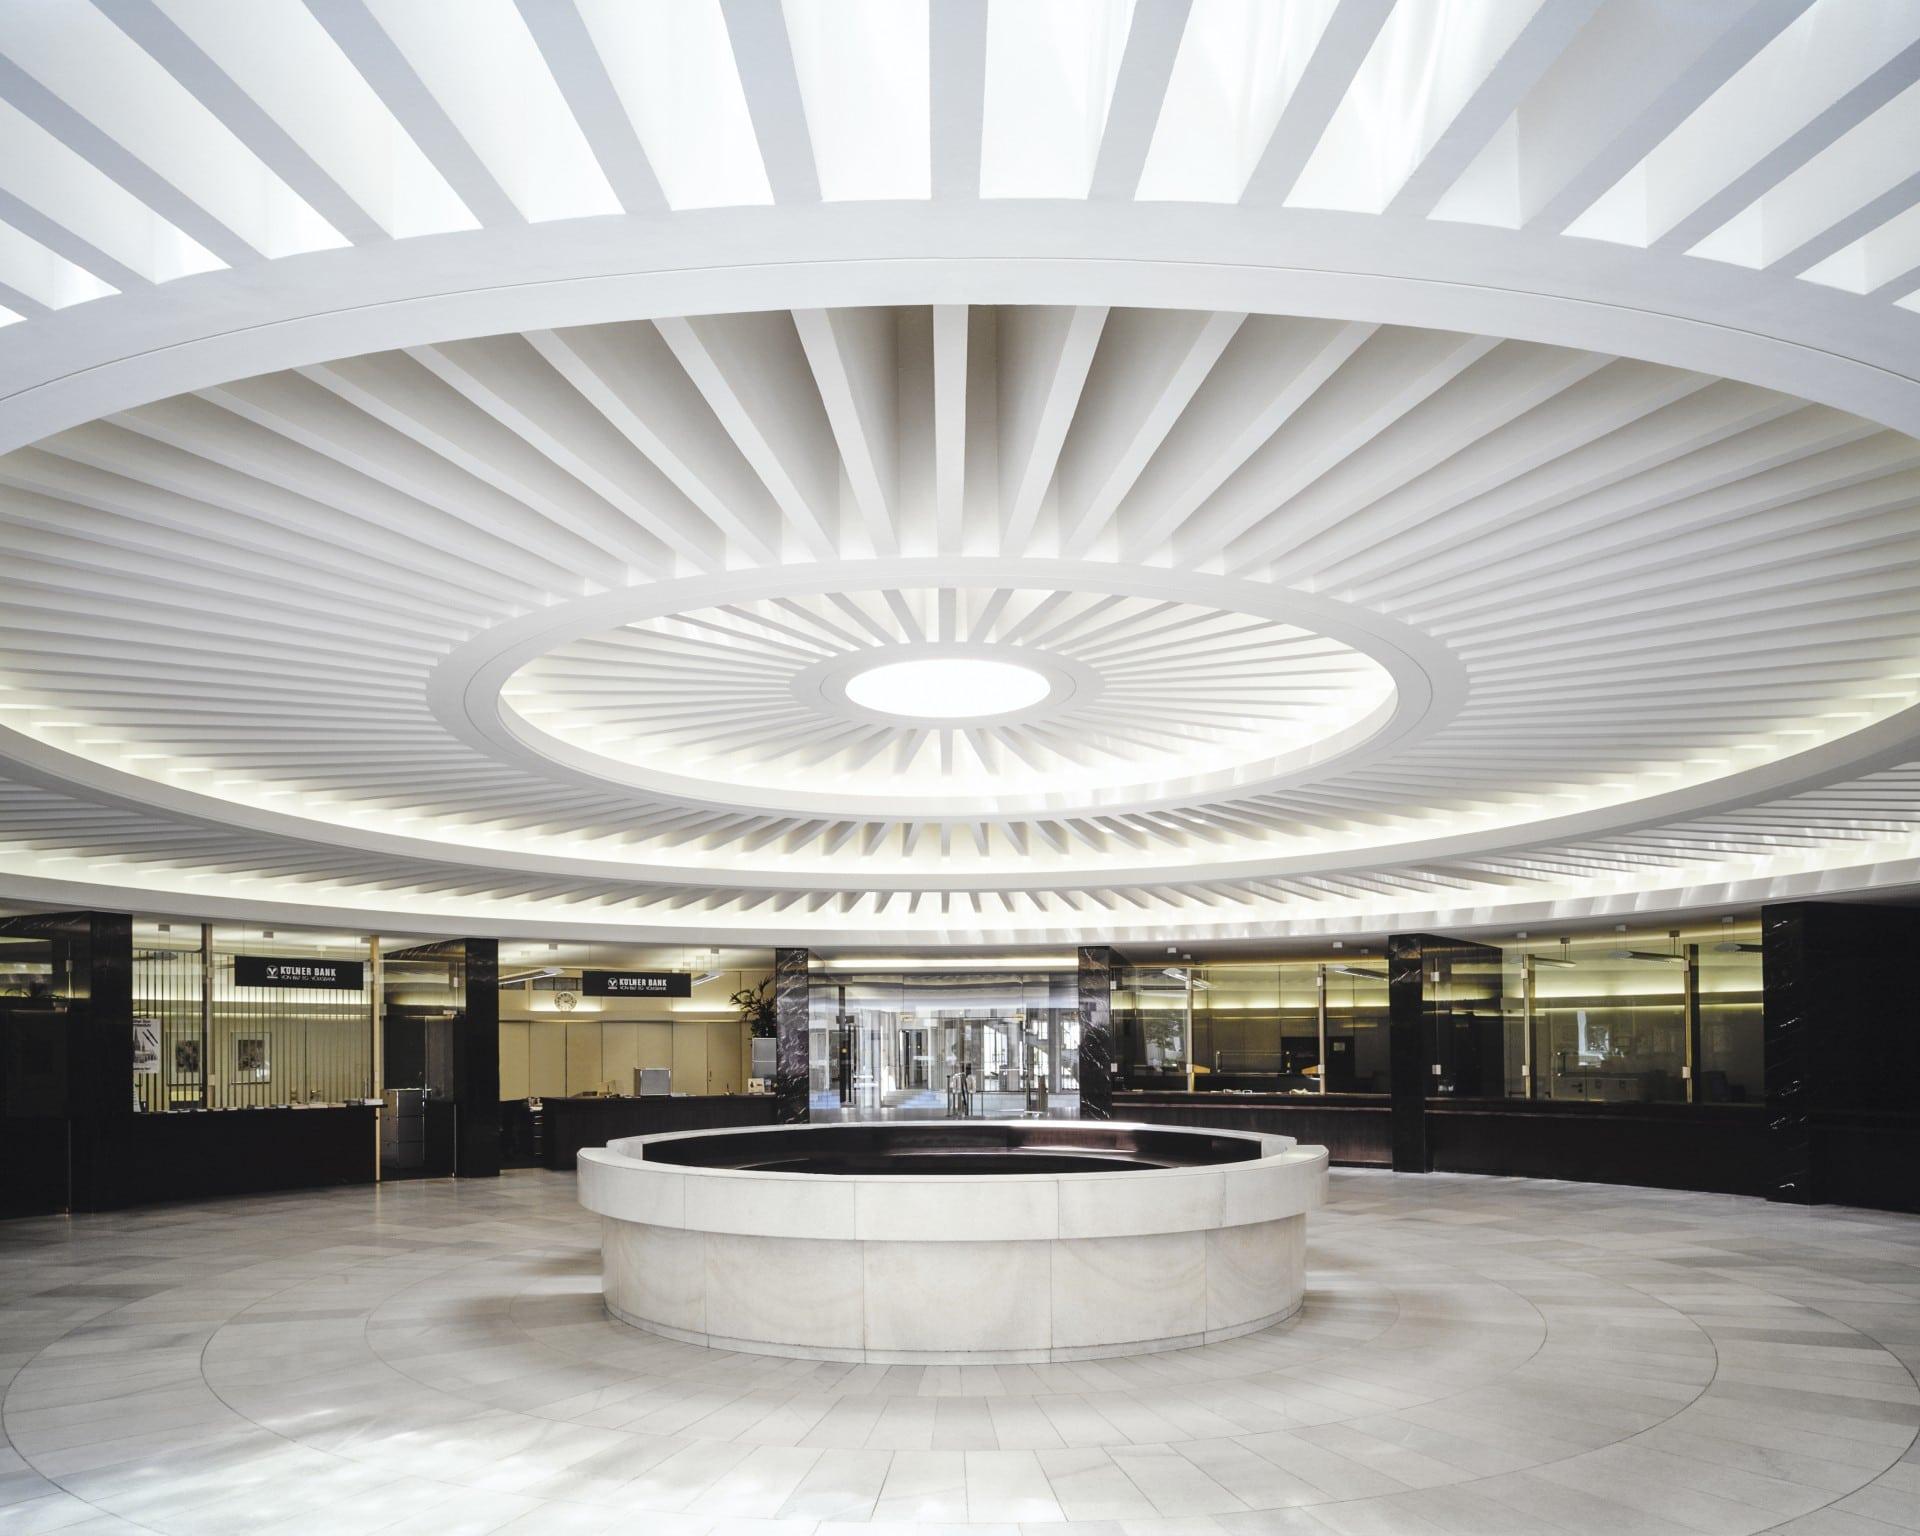 263-Chris-Franken-Architekturfotos-BvDBWN3k